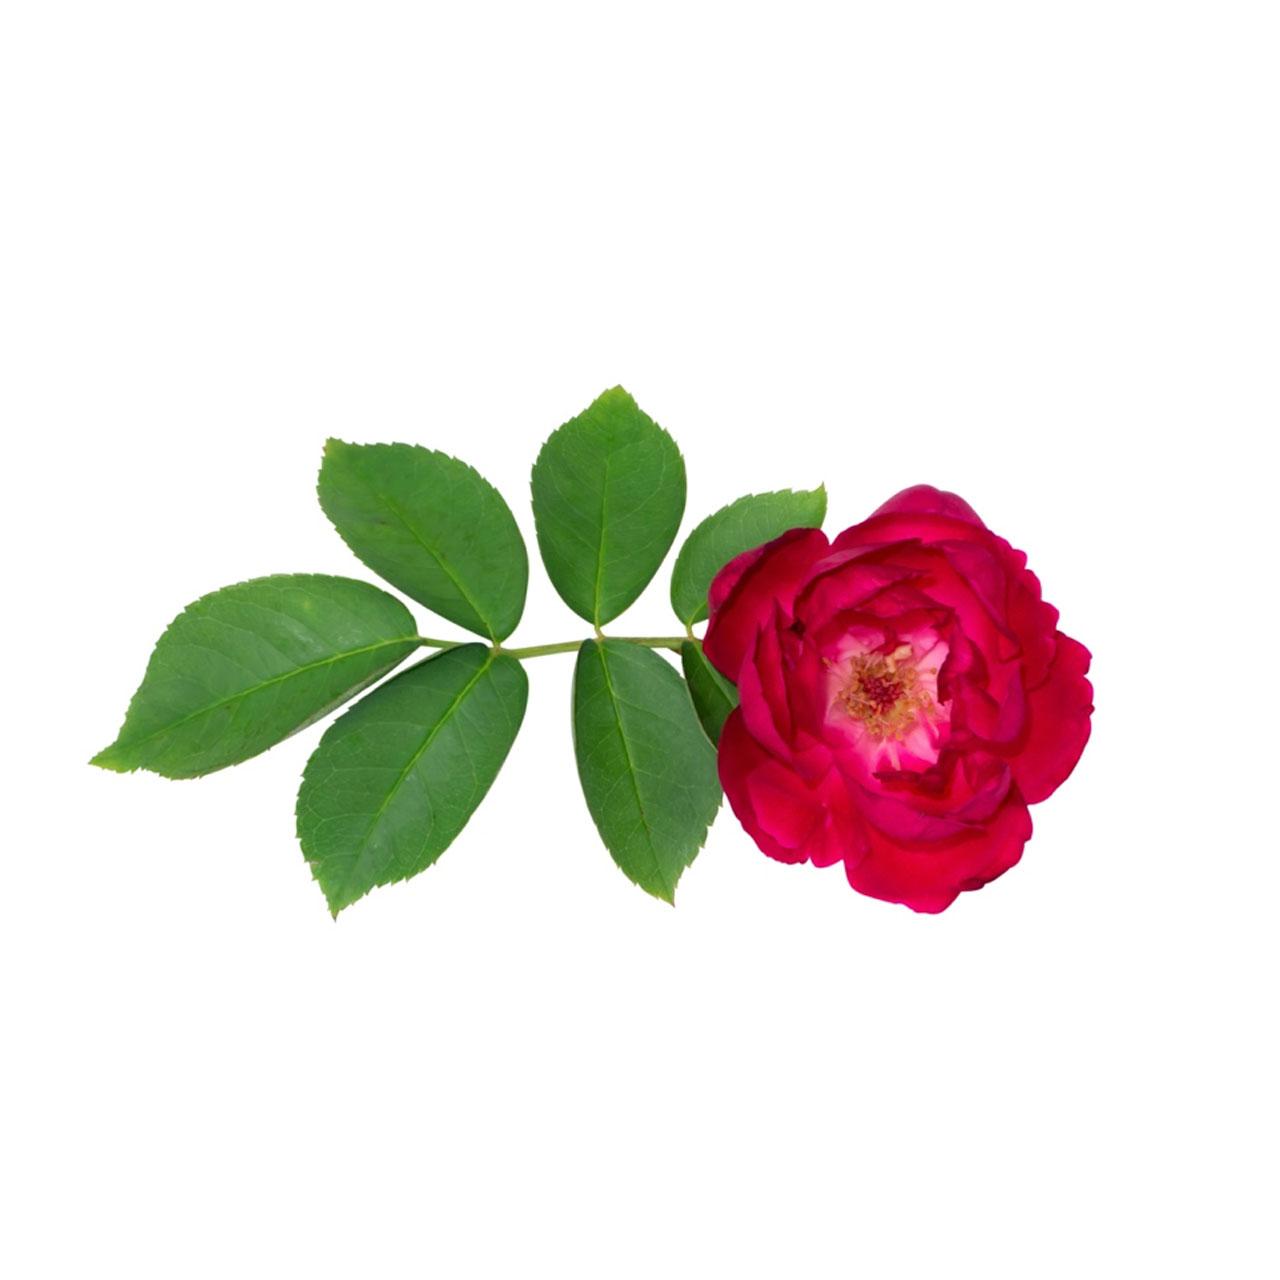 Rosa Damiscena Flower Water